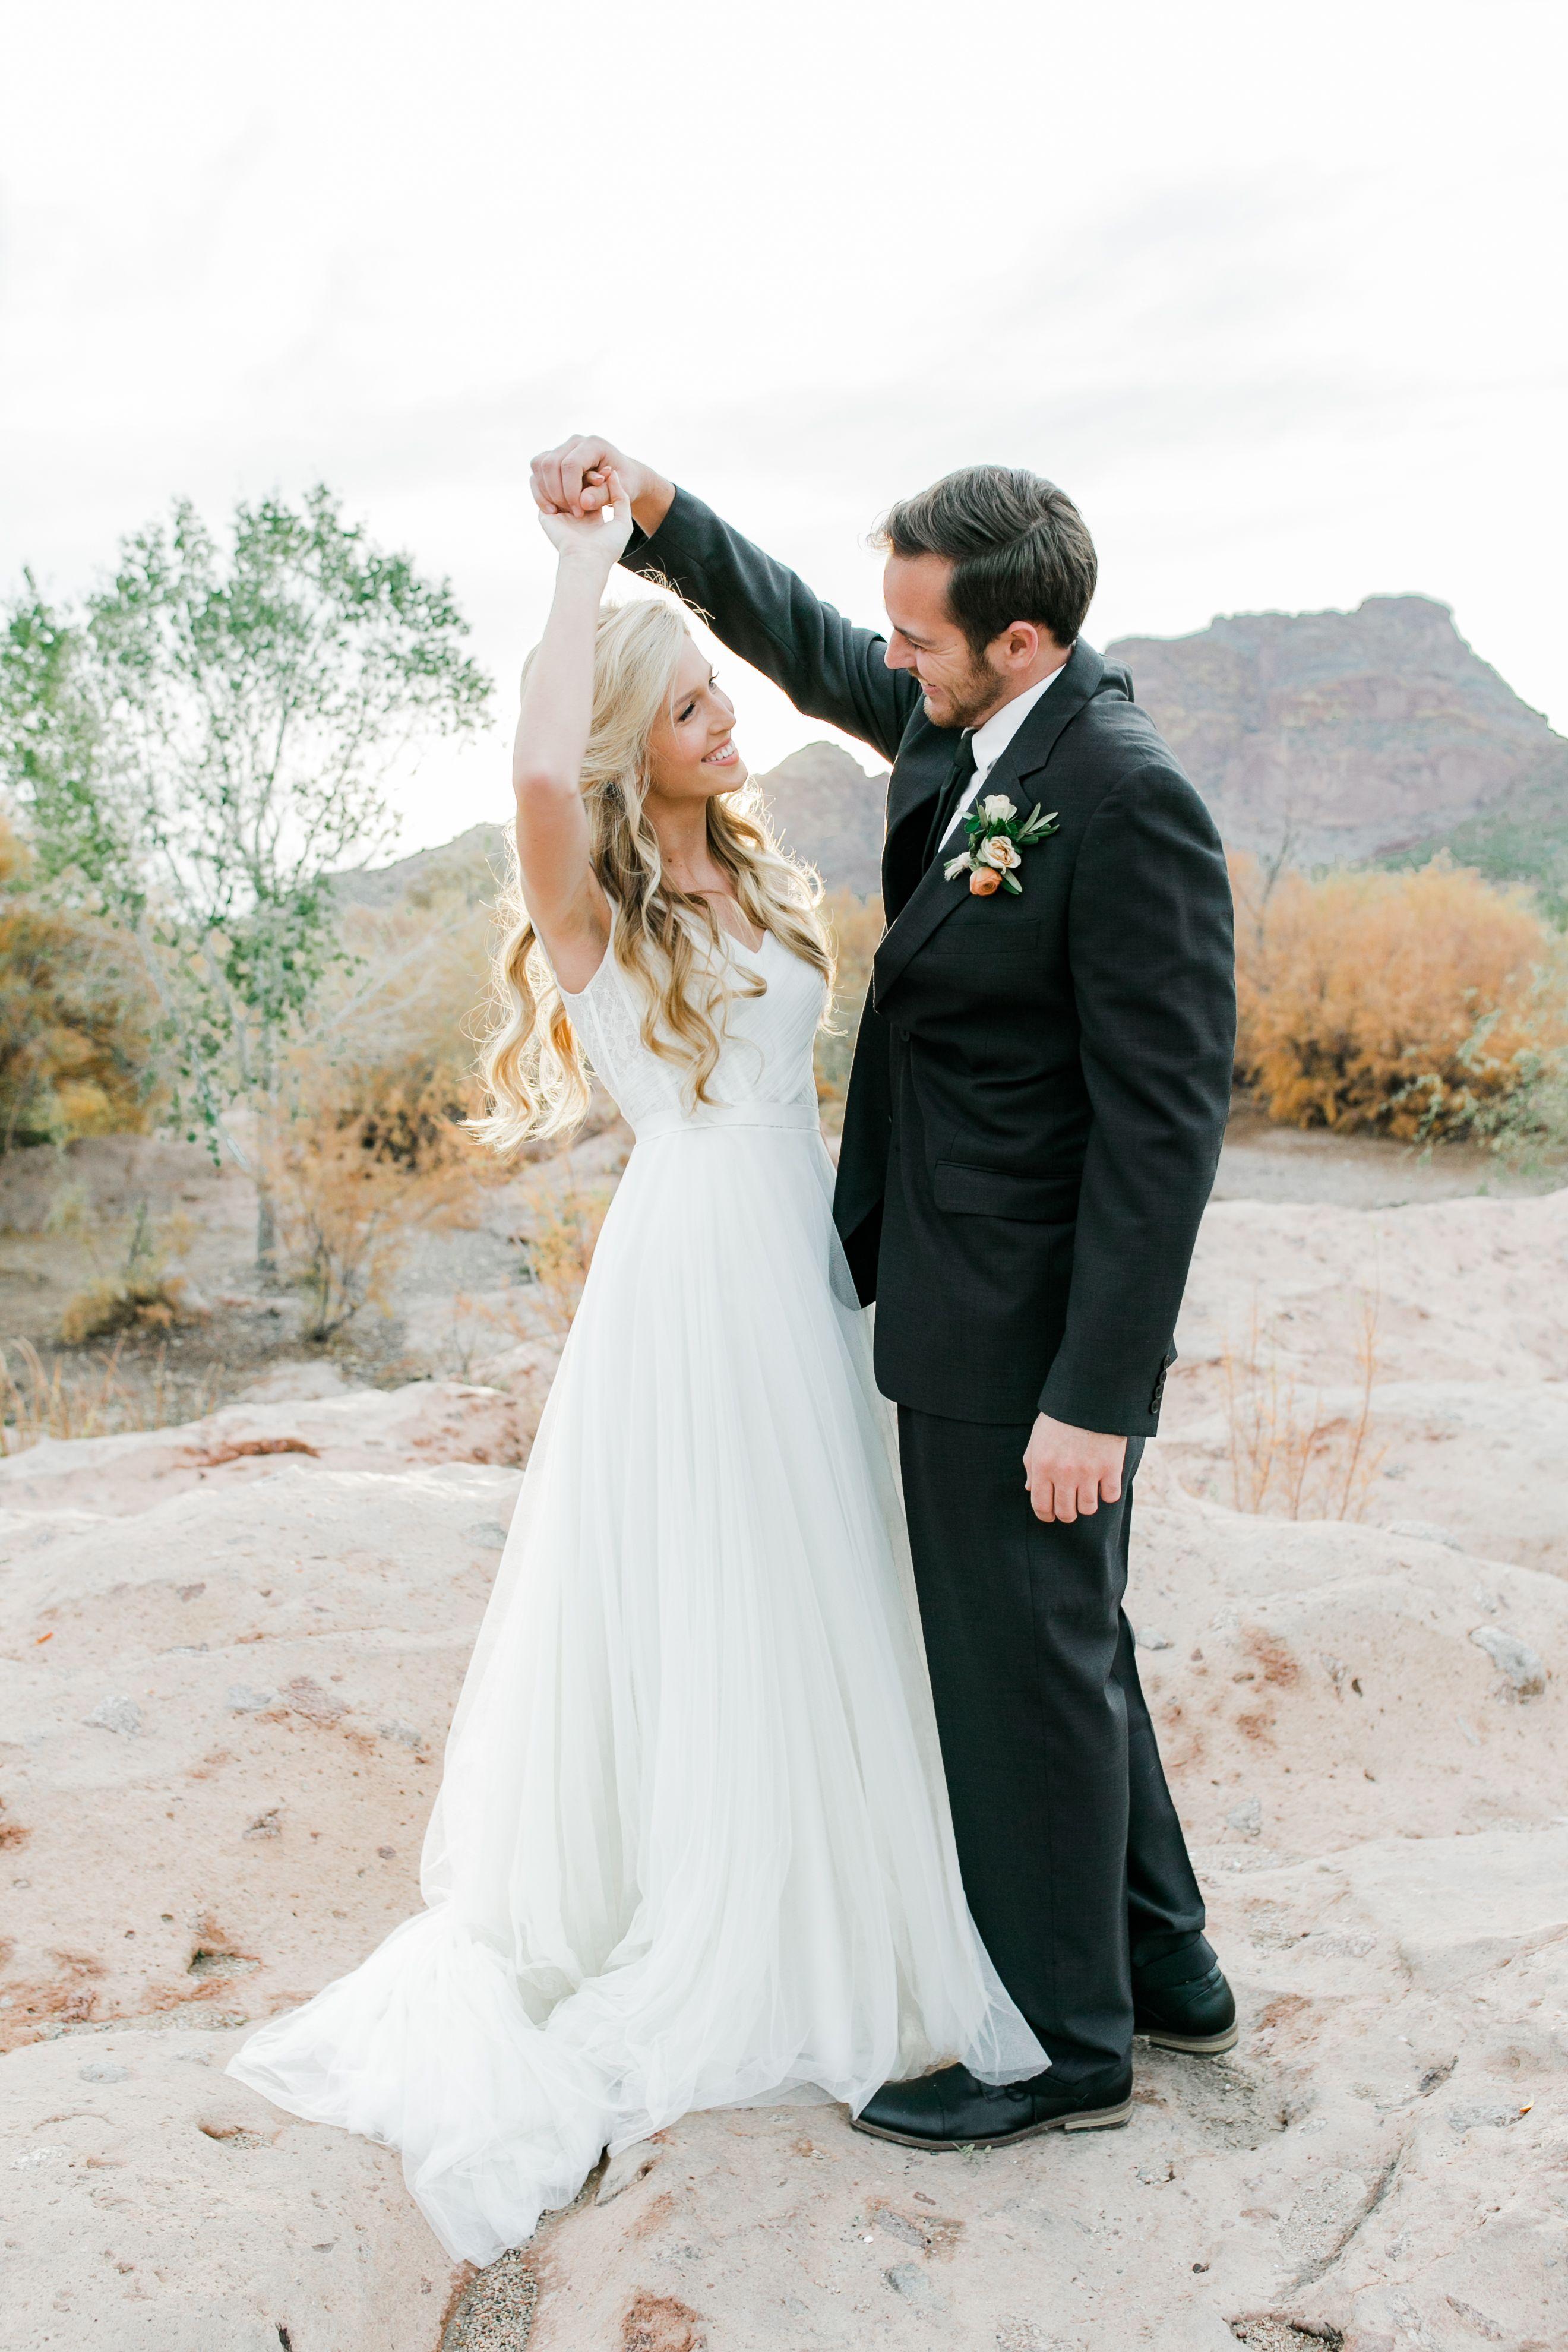 Best wedding dresses for 50 year olds  Desert Arizona Wedding  Karlie Colleen Photography  Romantic